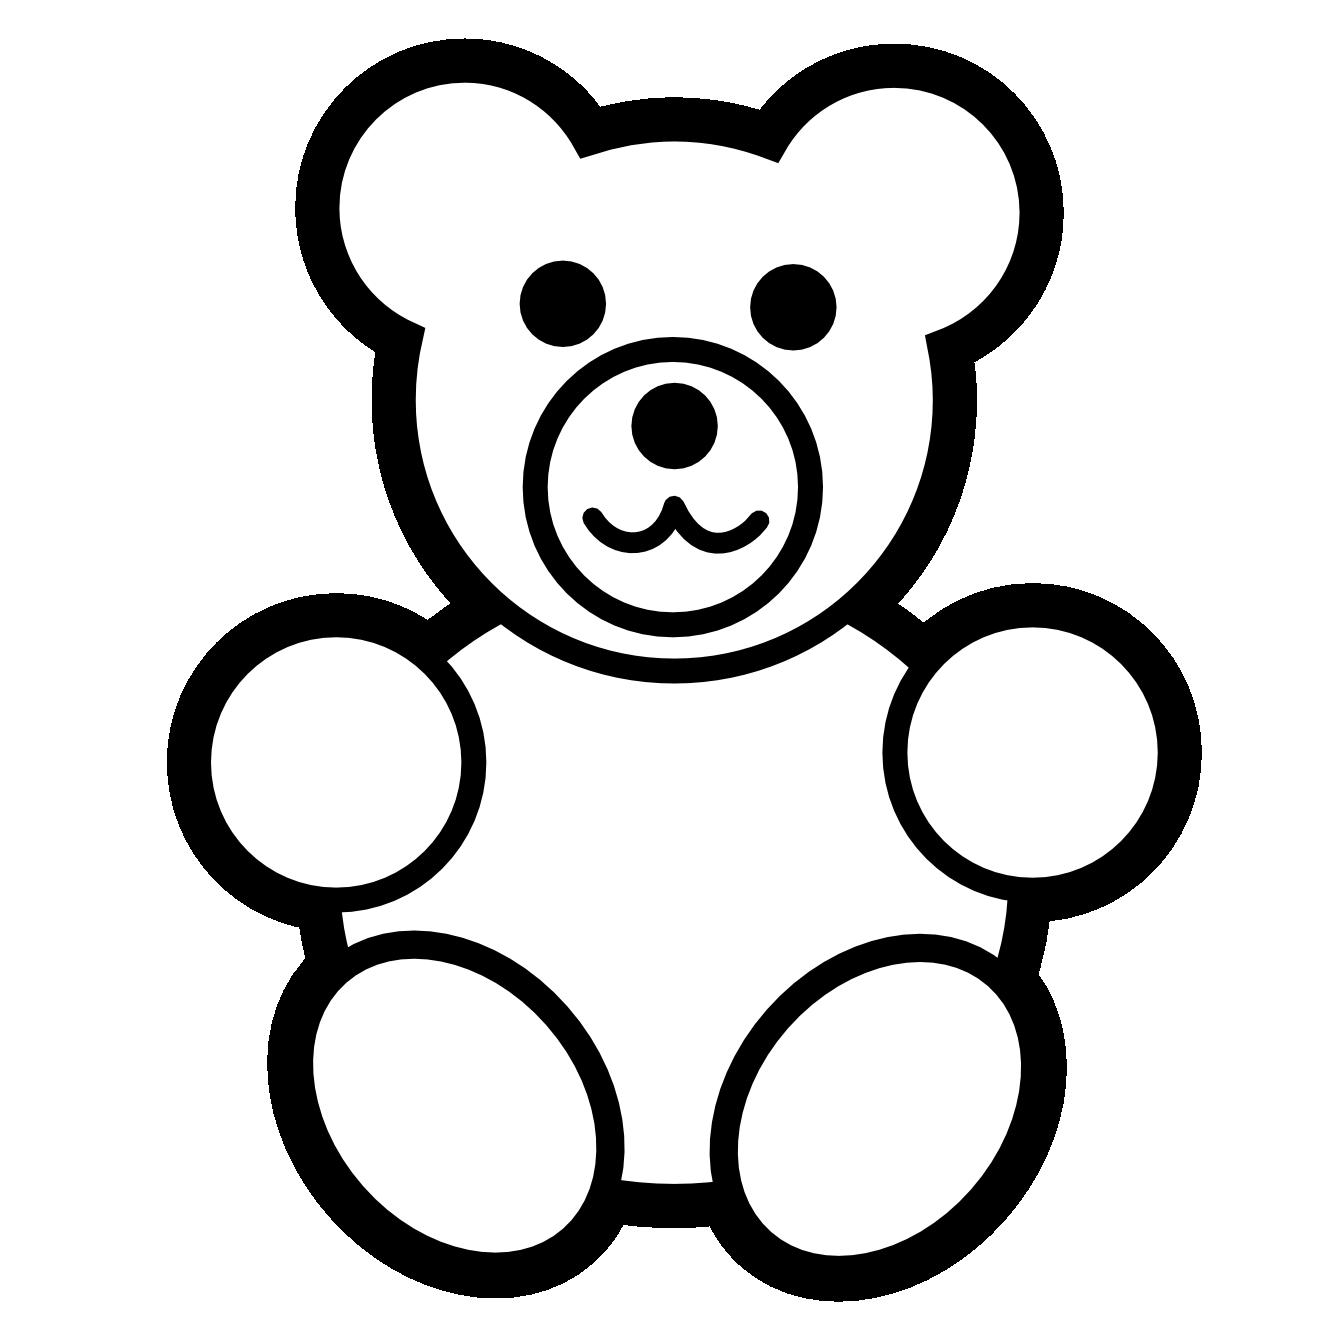 Teddy clipart stuffed animal #7